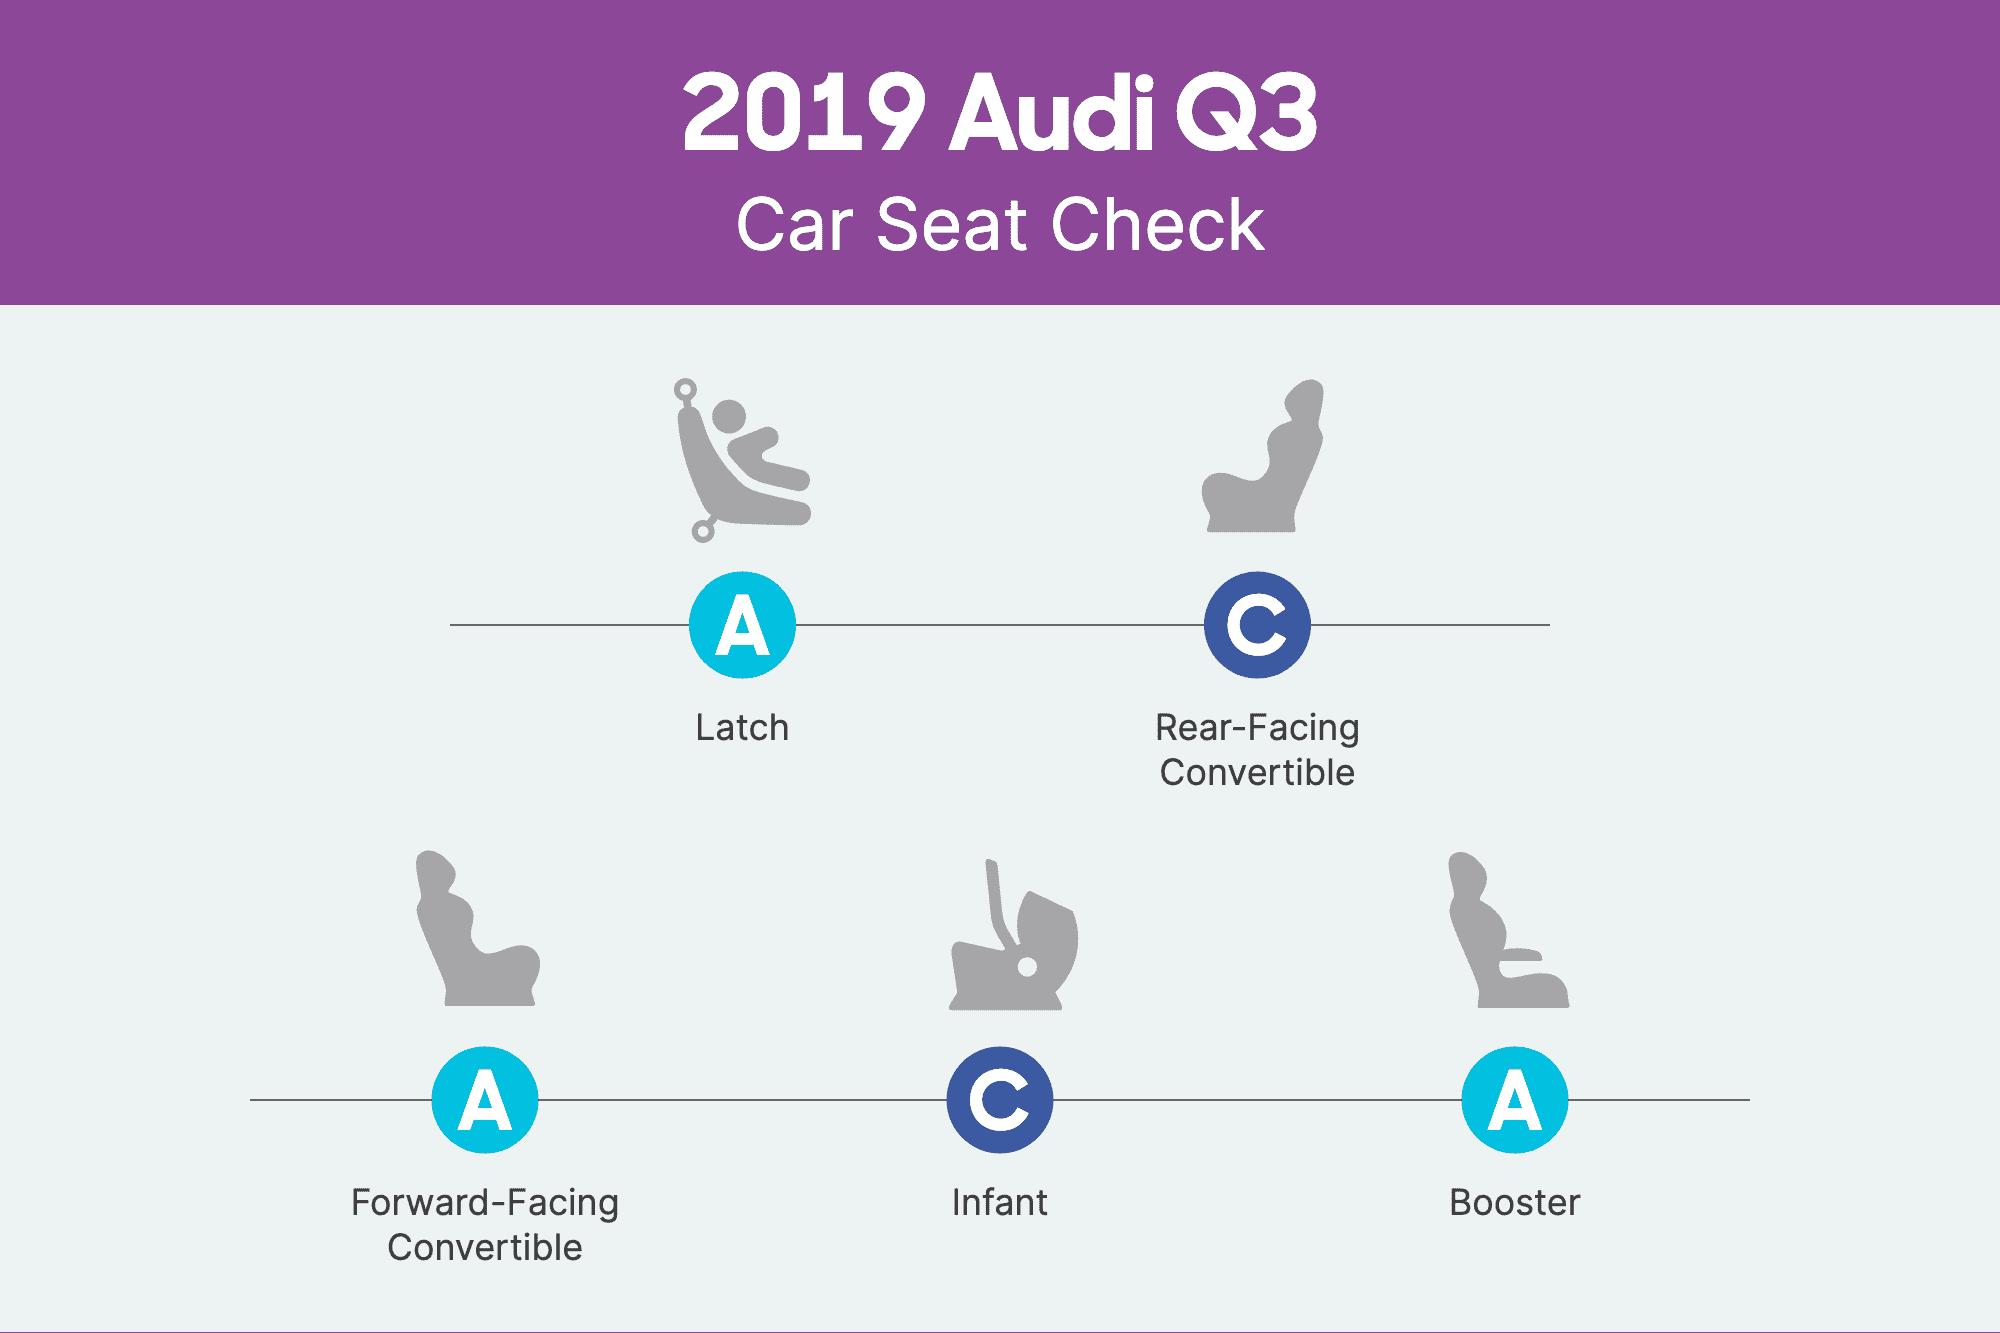 audi-q3-2019-csc-scorecard.png